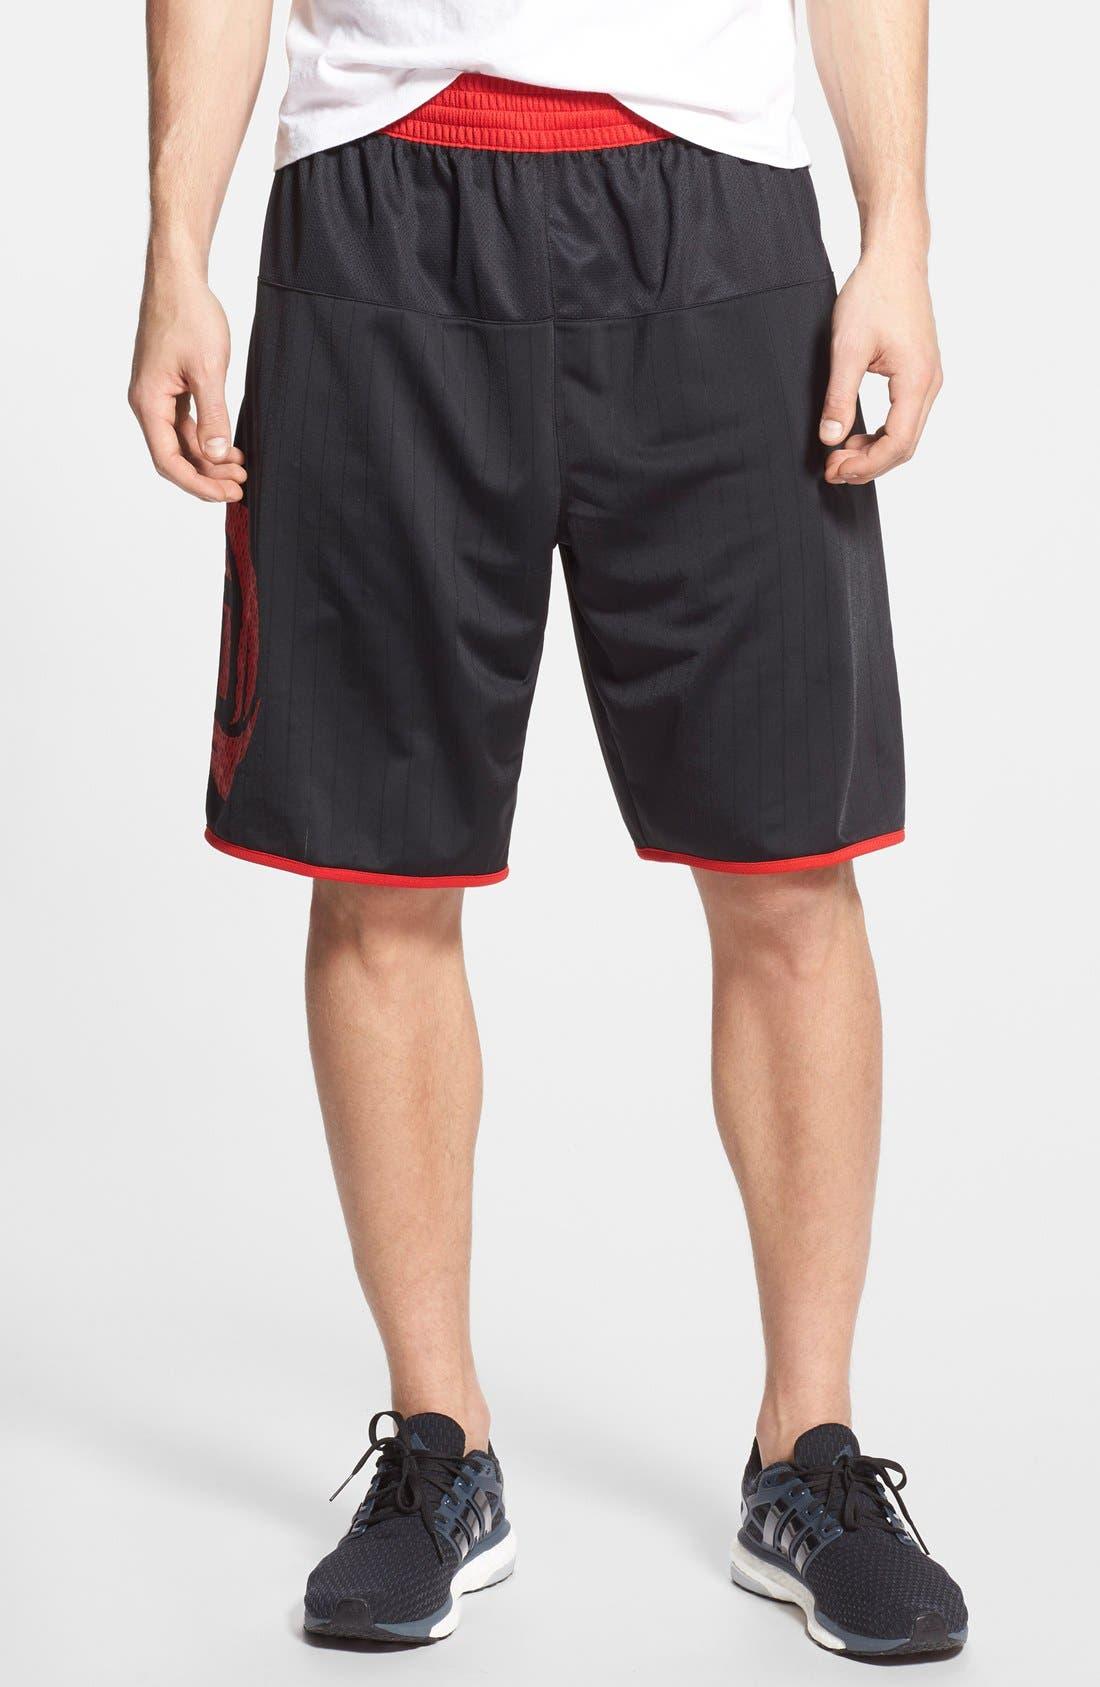 'D. Rose Jamfest' Basketball Shorts, Main, color, 001